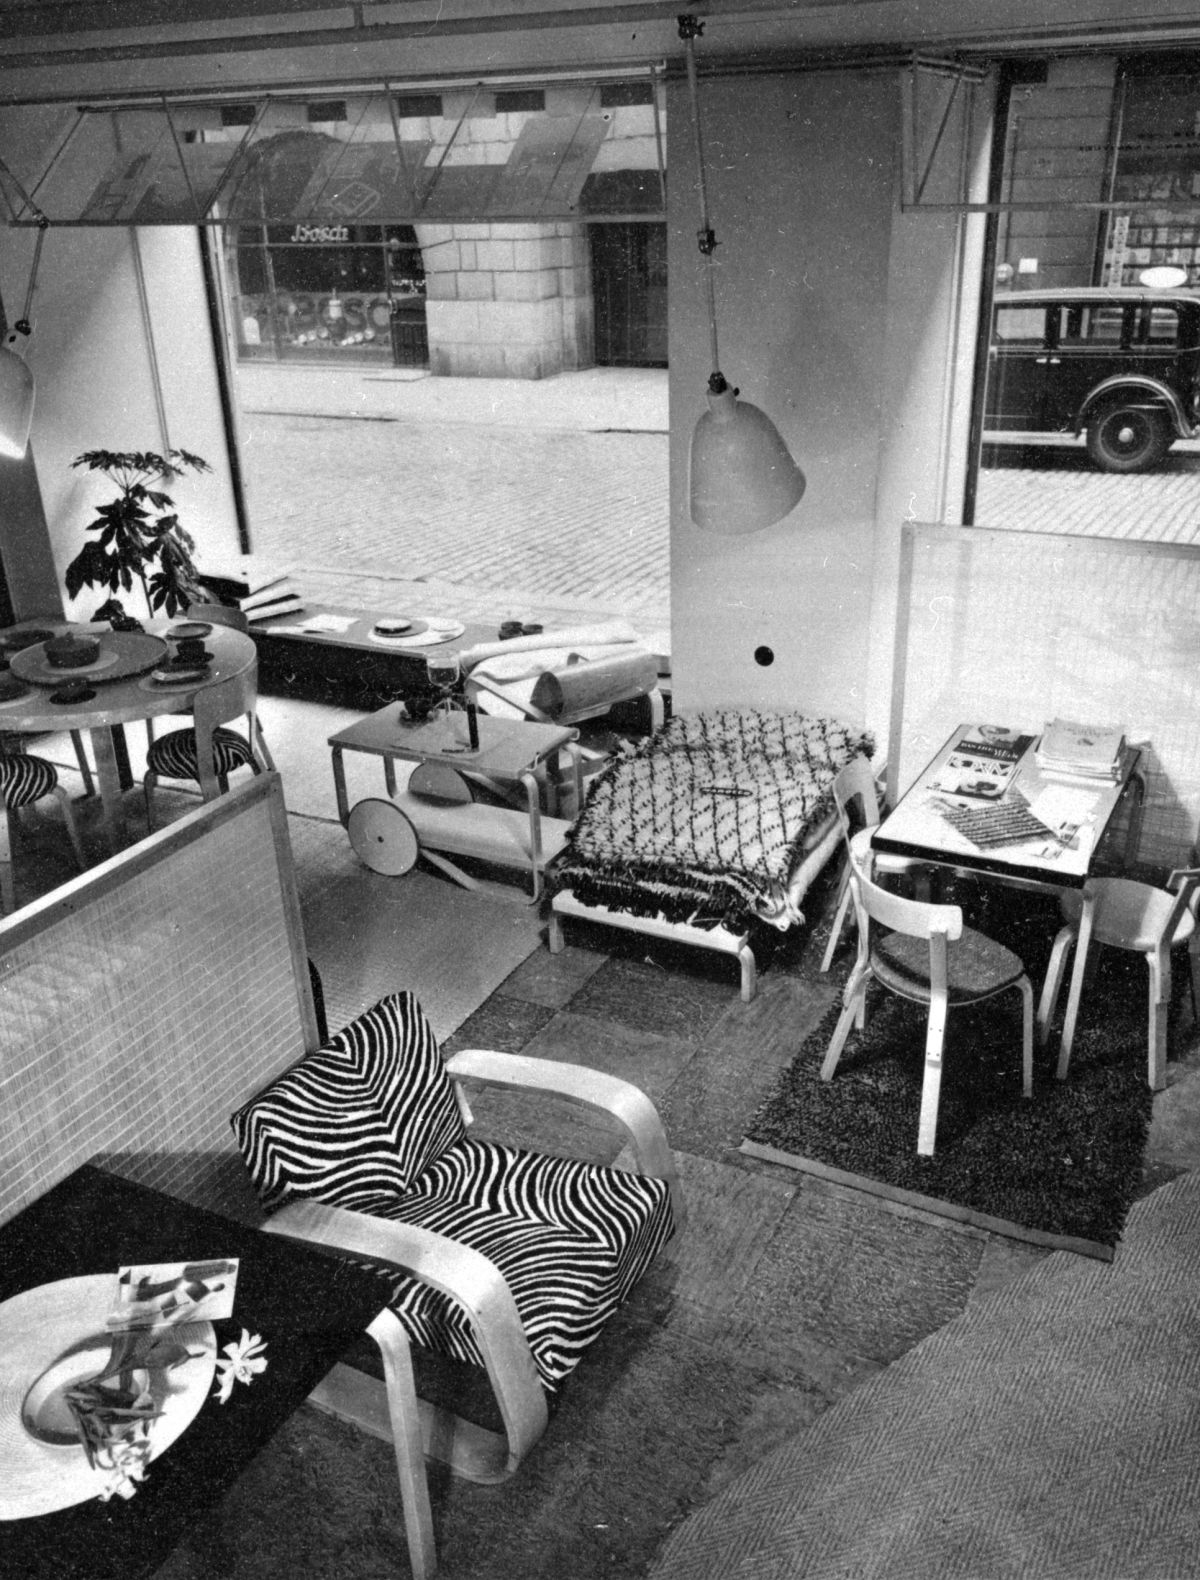 Fabianinkatu-First-Artek-Store-In-Helsinki-1936